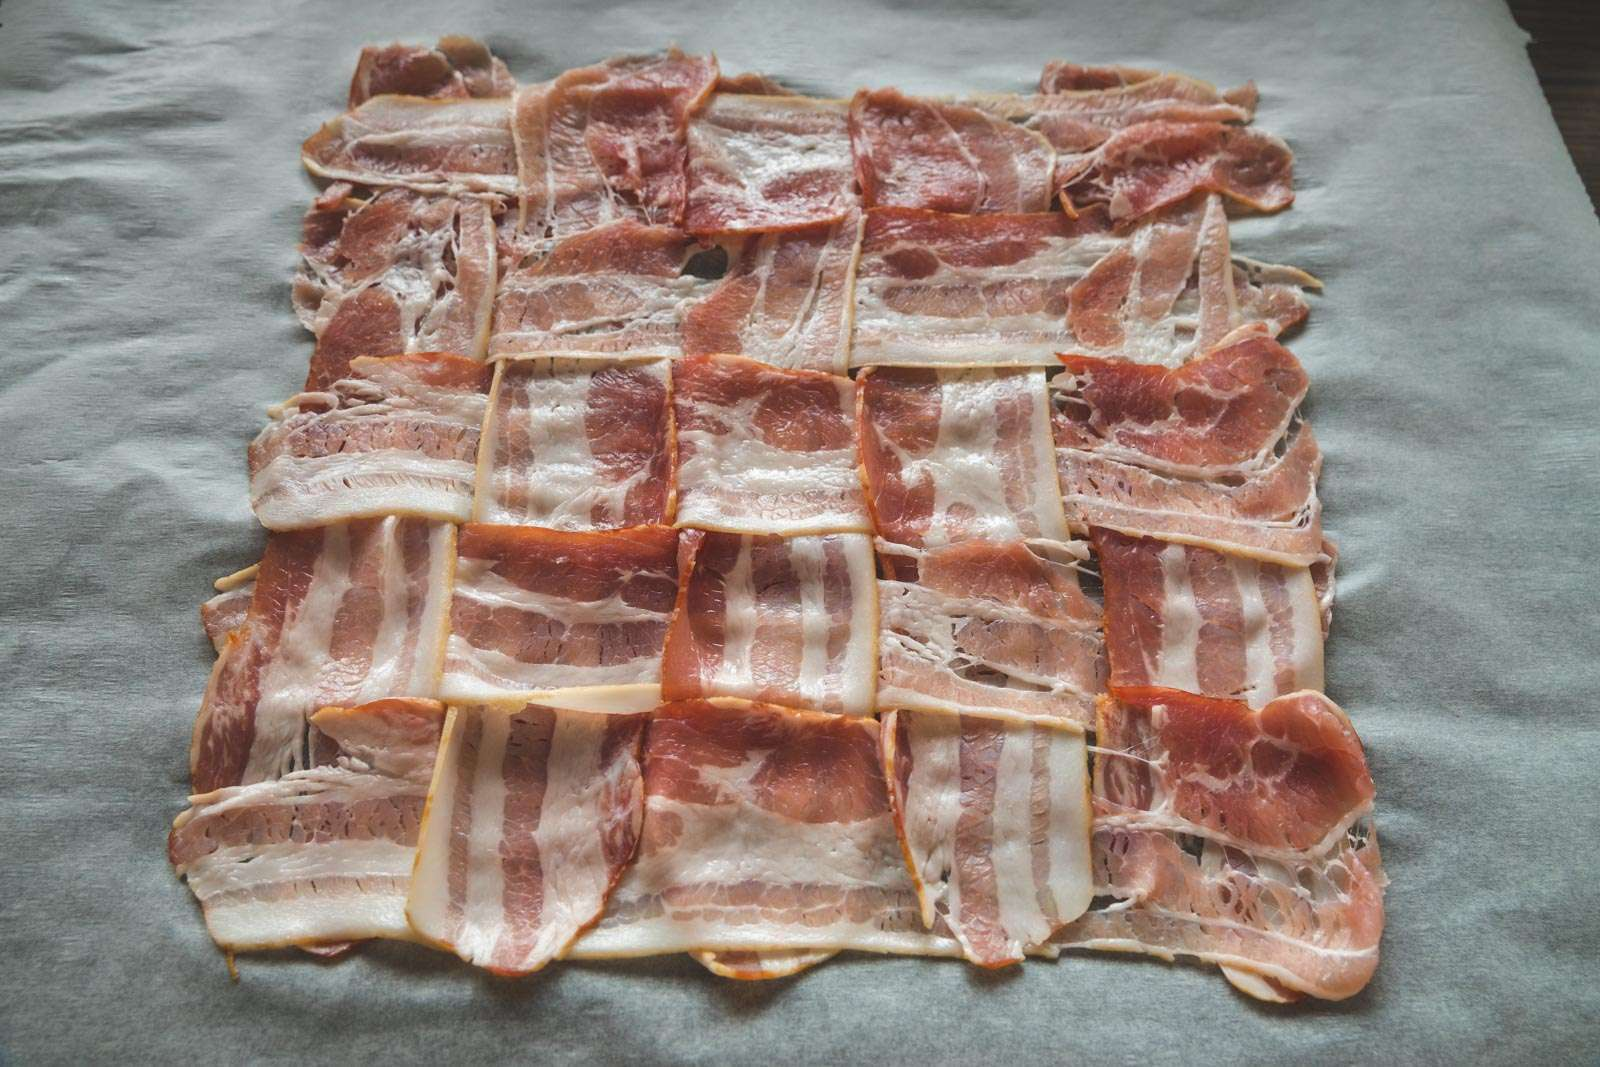 Receptafbeelding | Bacon Wrapped Meatloaf | gevlochten bacon